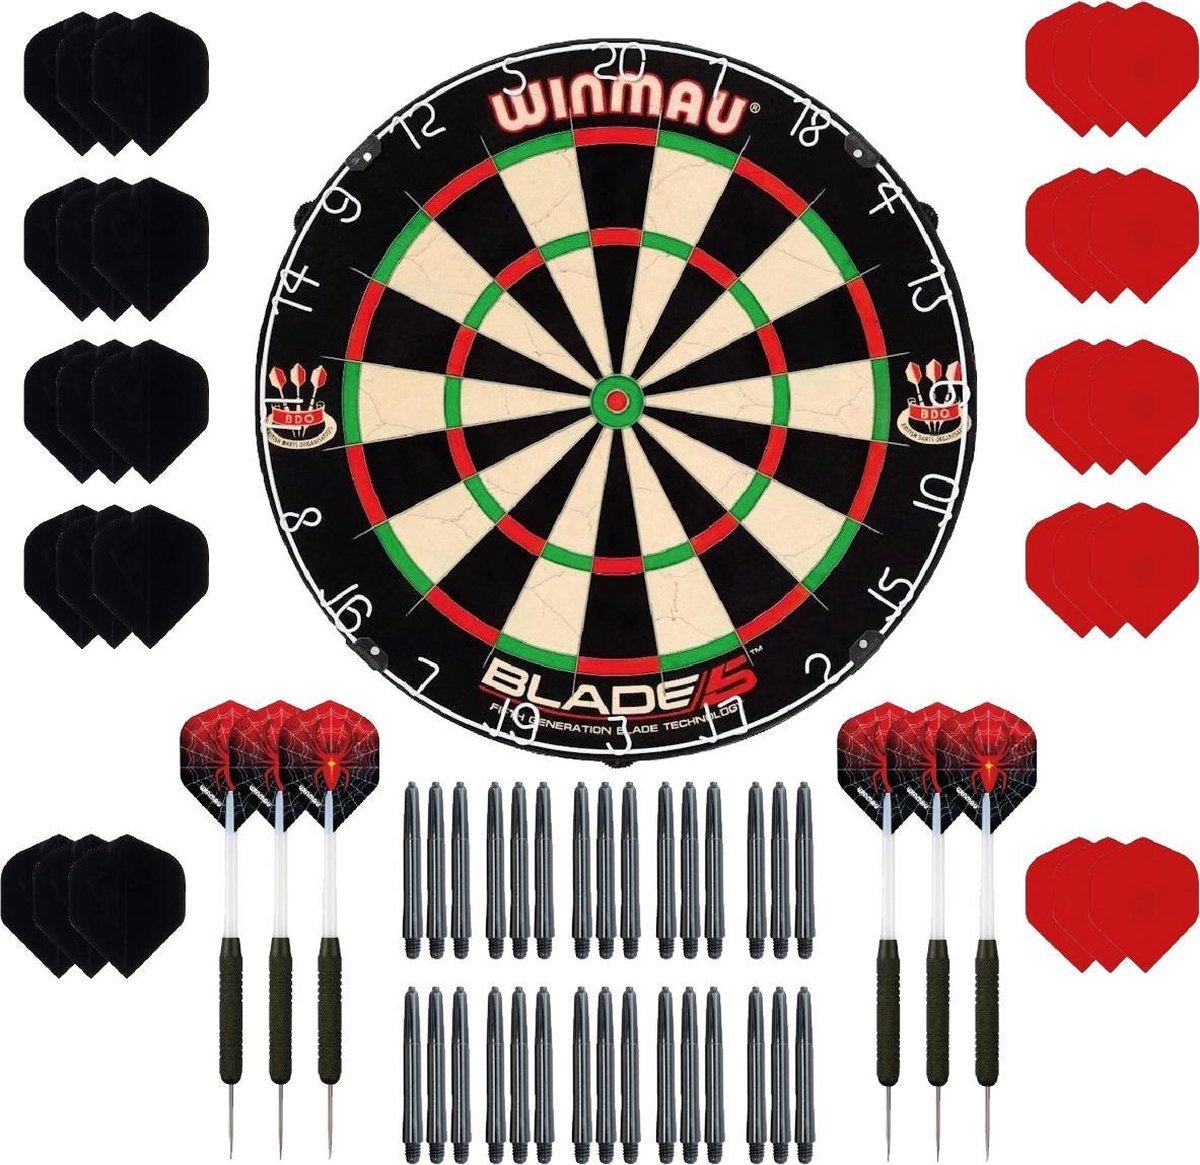 Winmau Blade 5 - dartbord - plus 2 sets - dartpijlen - plus 30 - dartflights - plus 30 - dartshafts - cadeauset